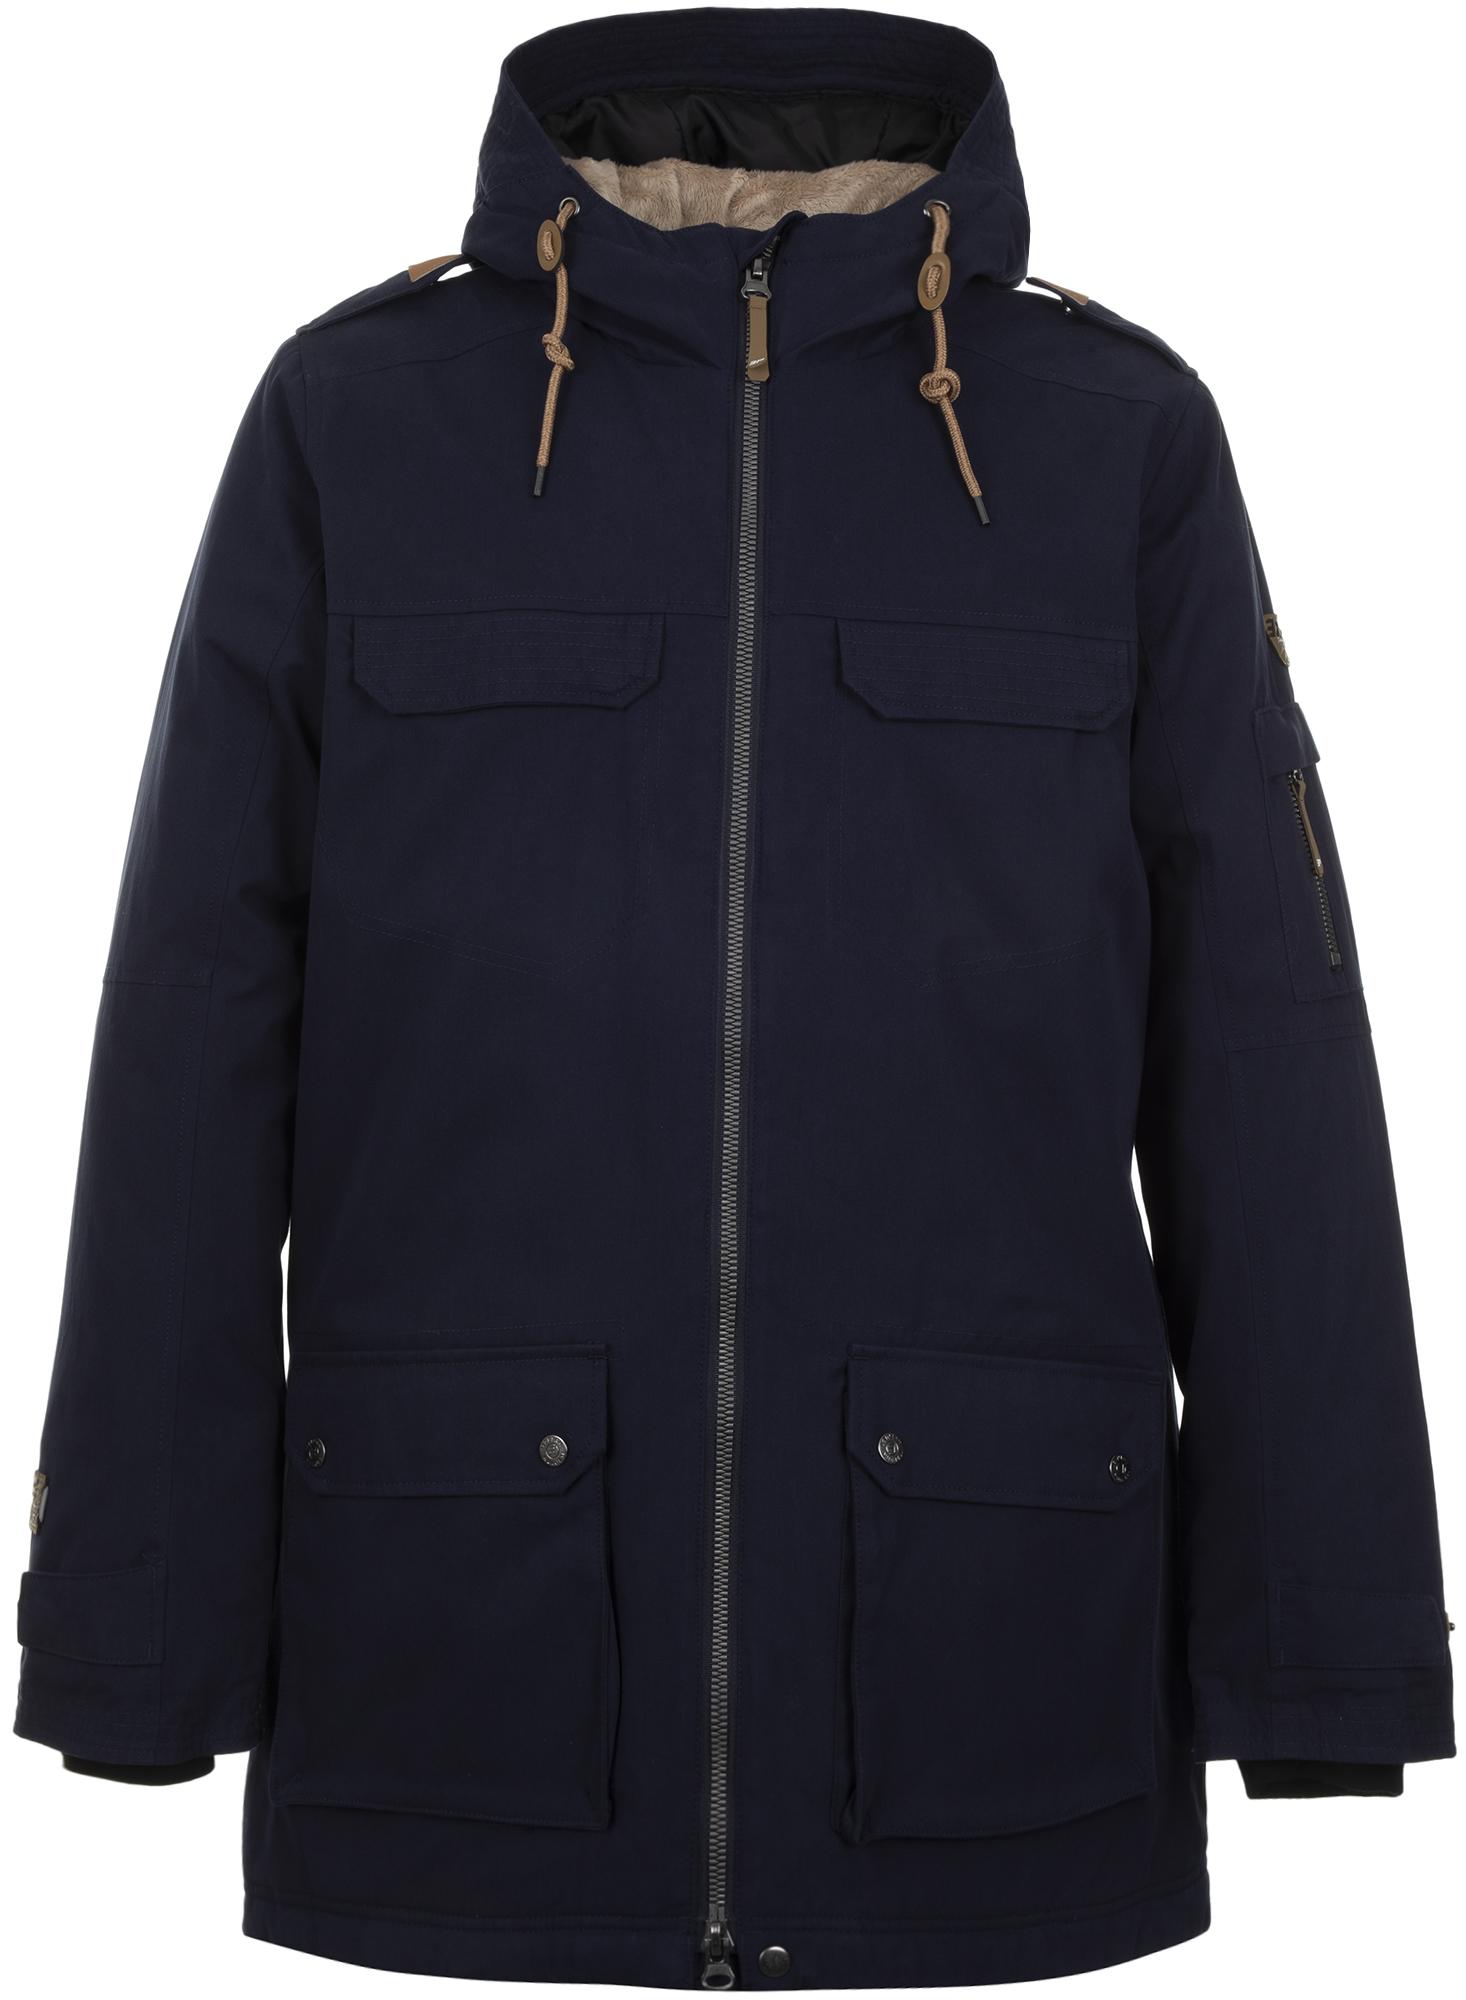 IcePeak Куртка утепленная мужская IcePeak Vince, размер 56